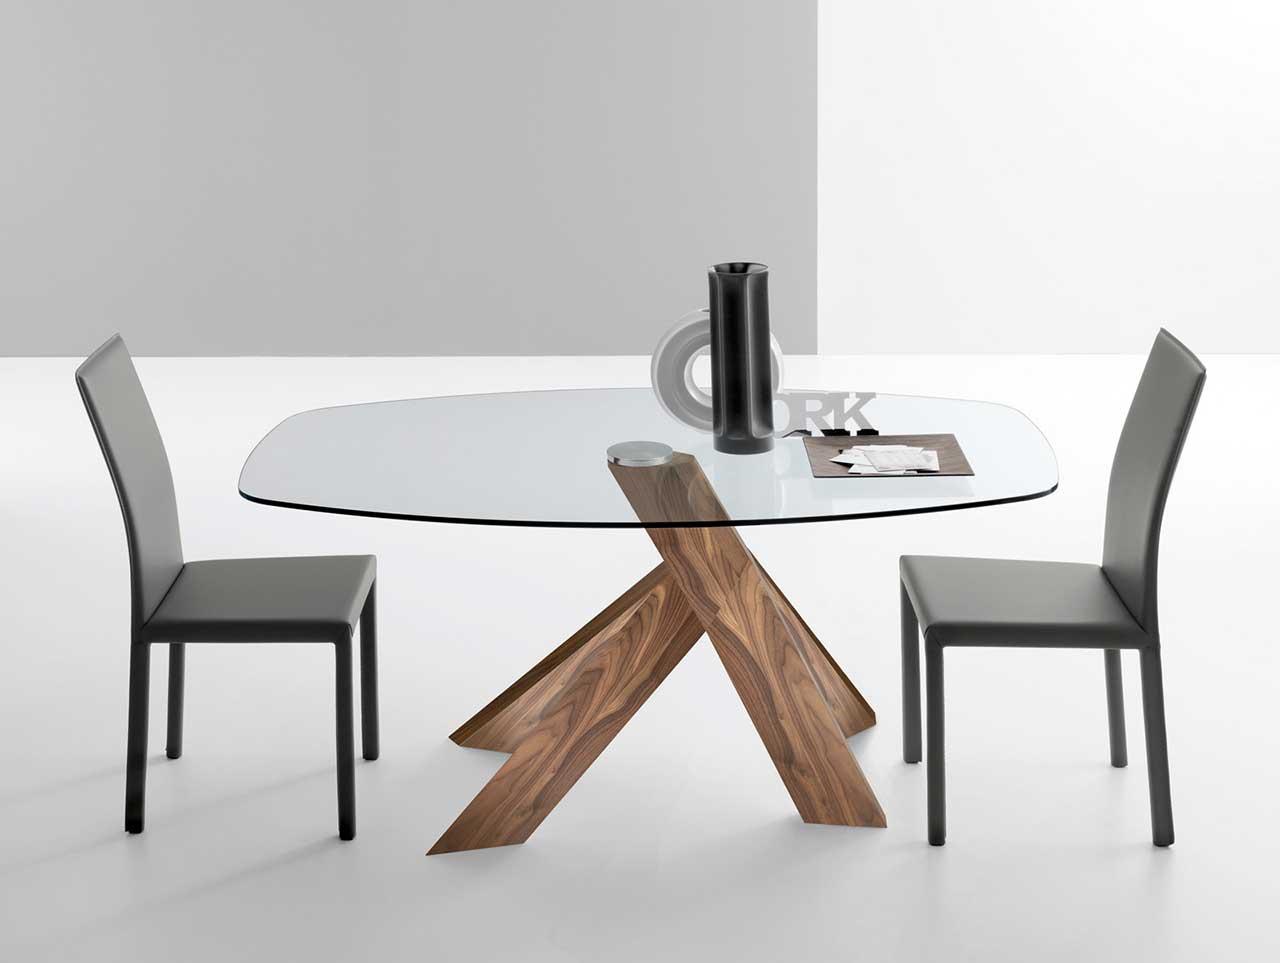 Meubles Marinier cuisine salon tables et chaises